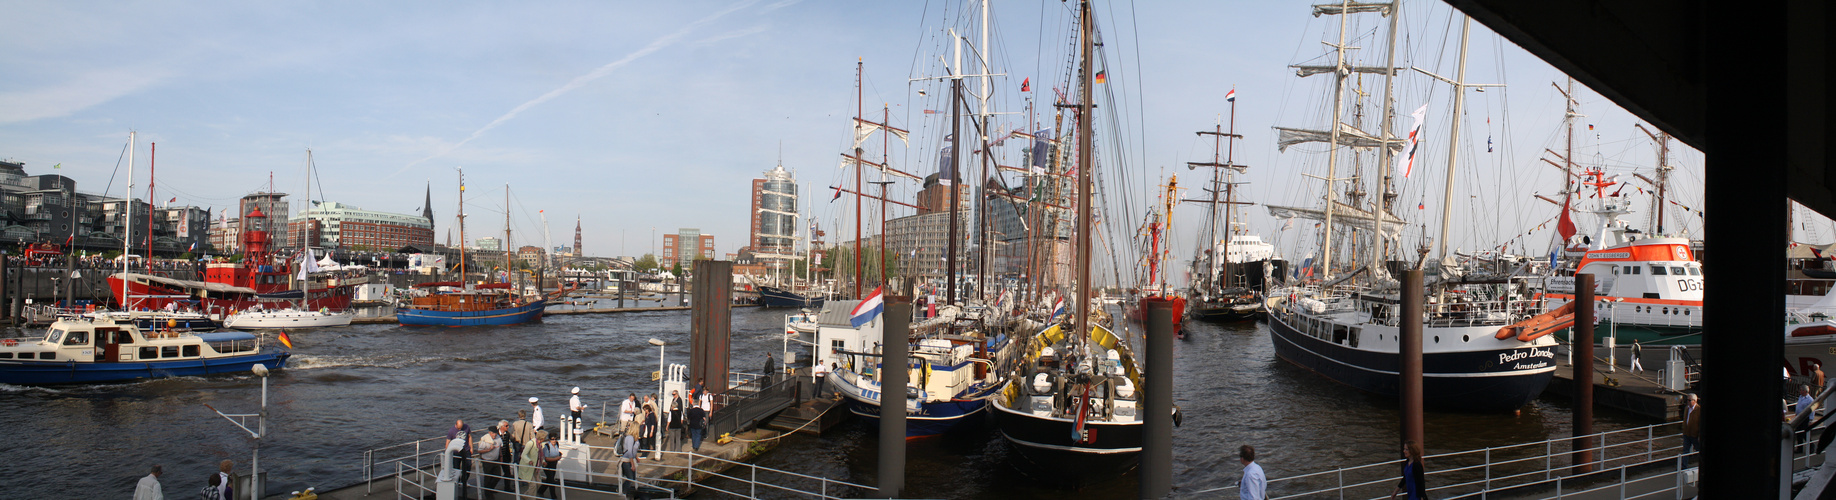 Hafengeburtstag 2011